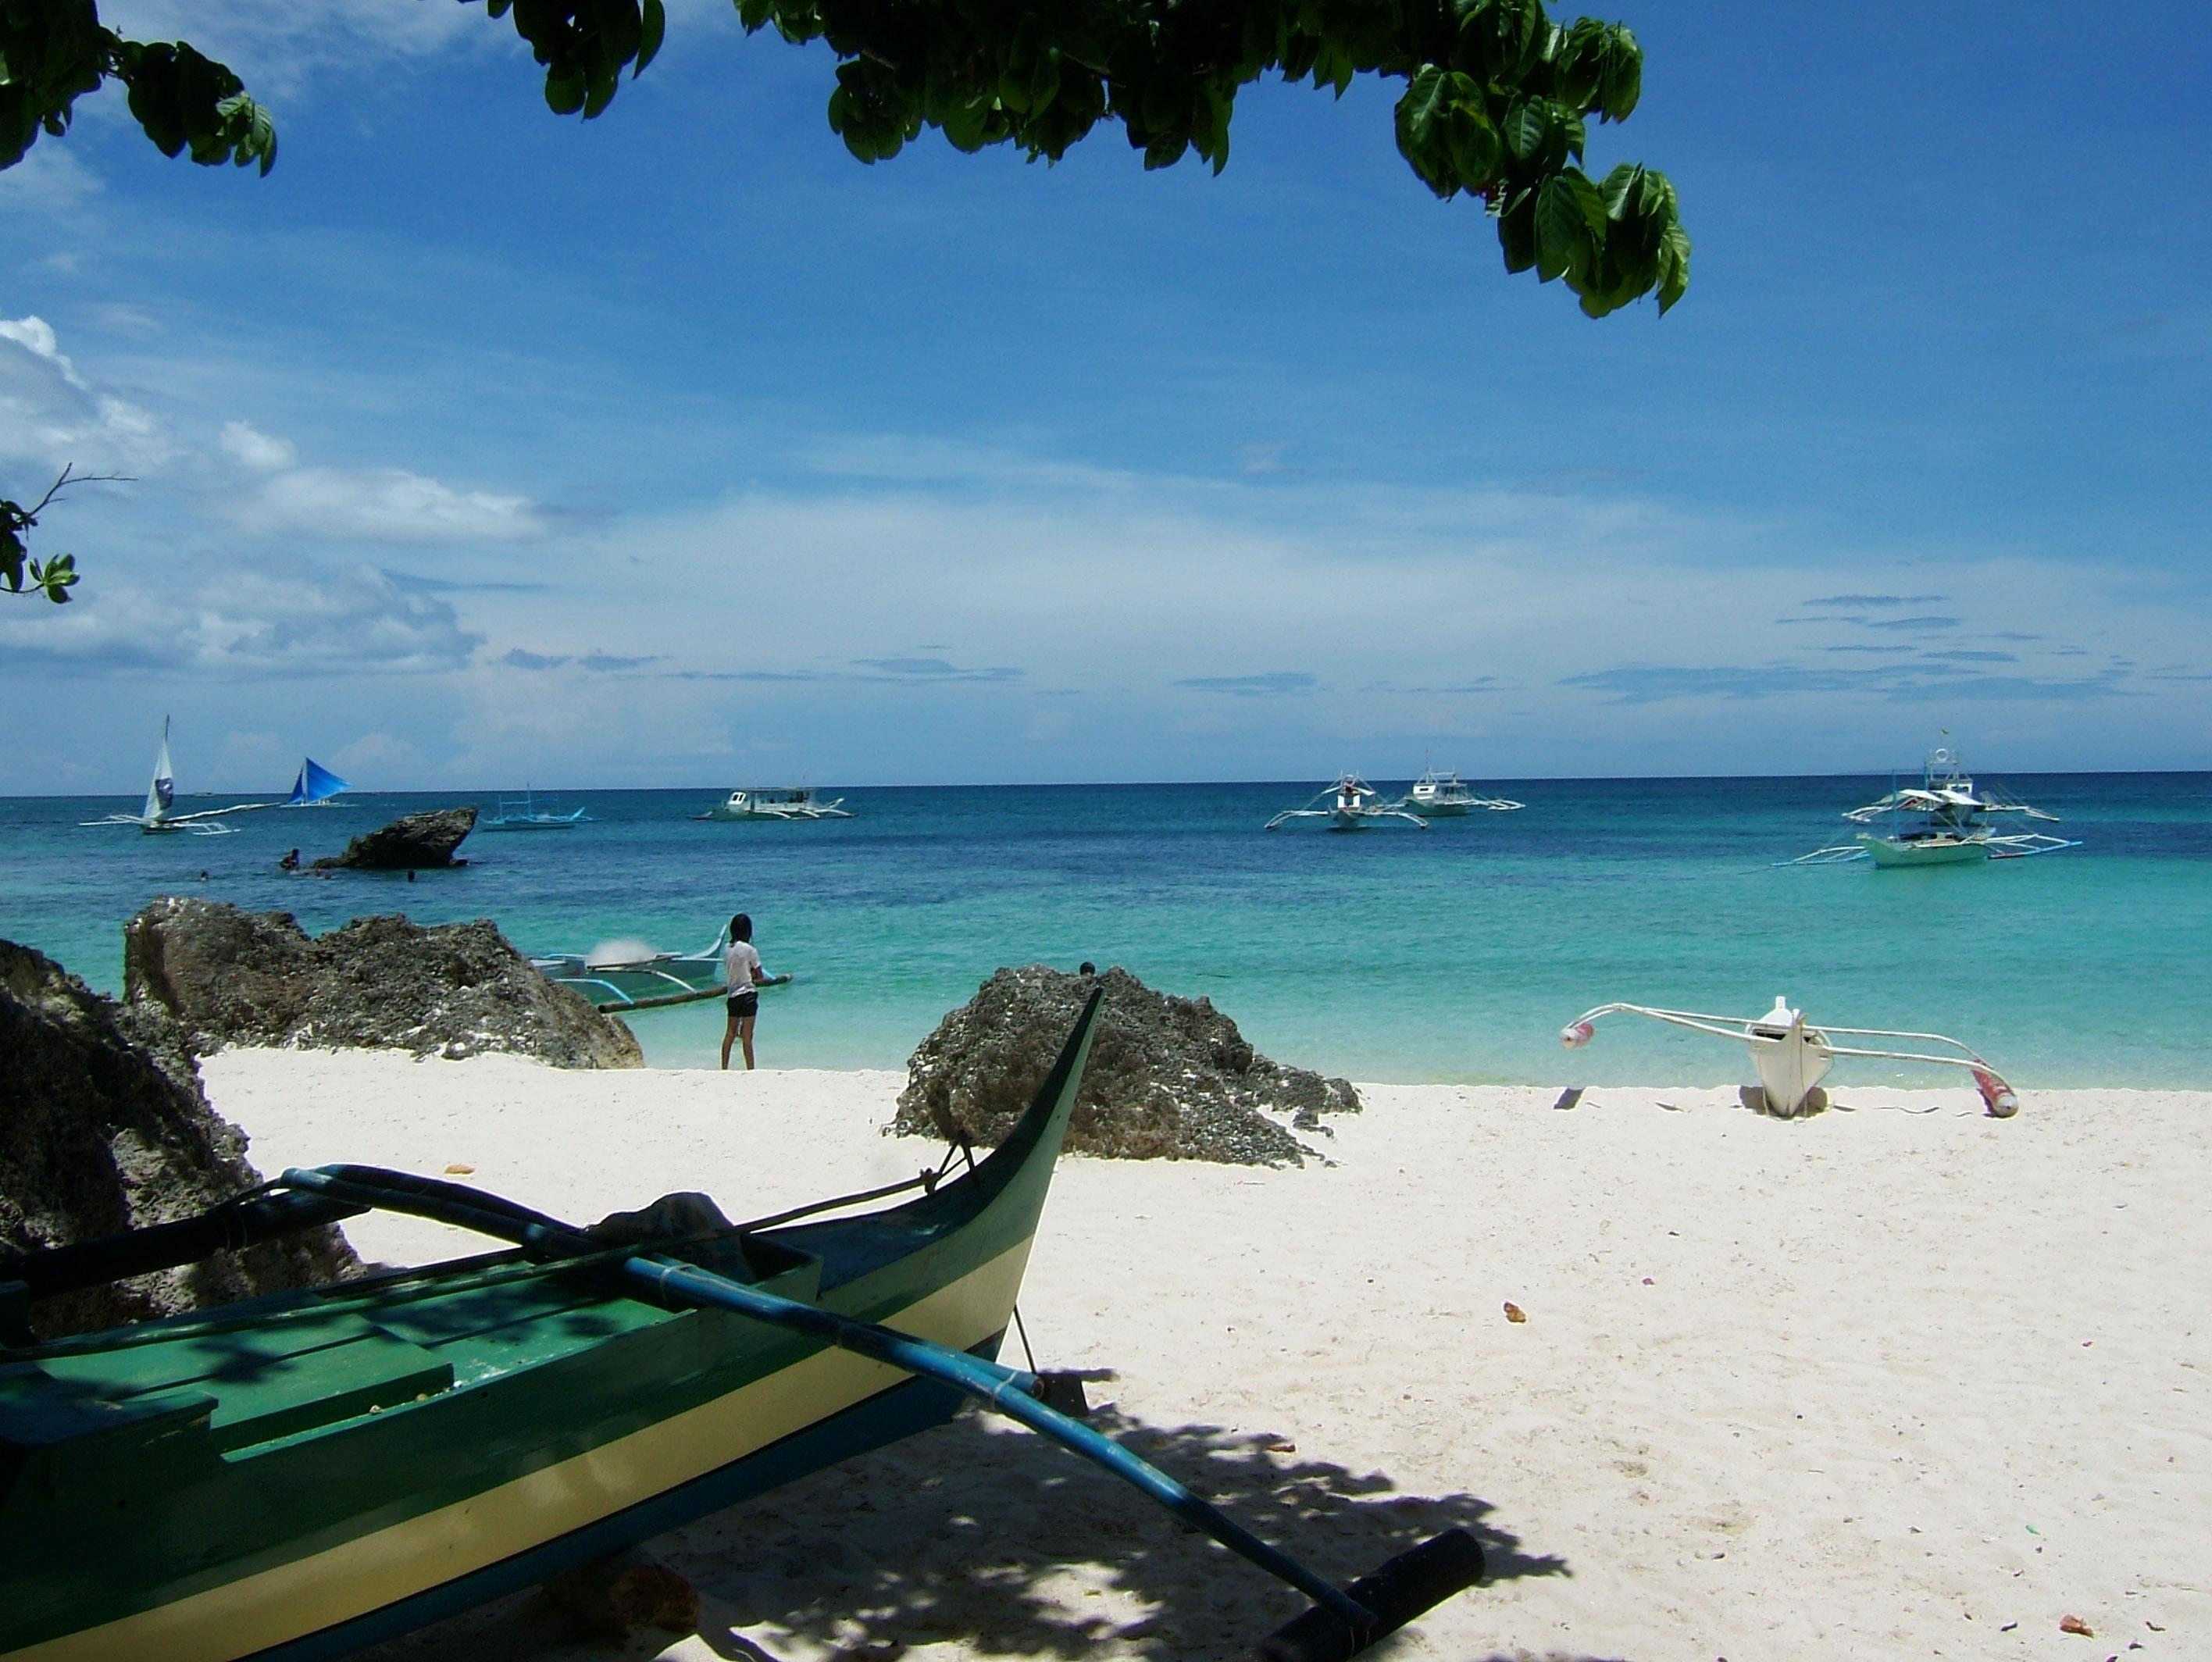 Philippines Sugar Islands Boracay Punta bunga beach Resorts 2007 14